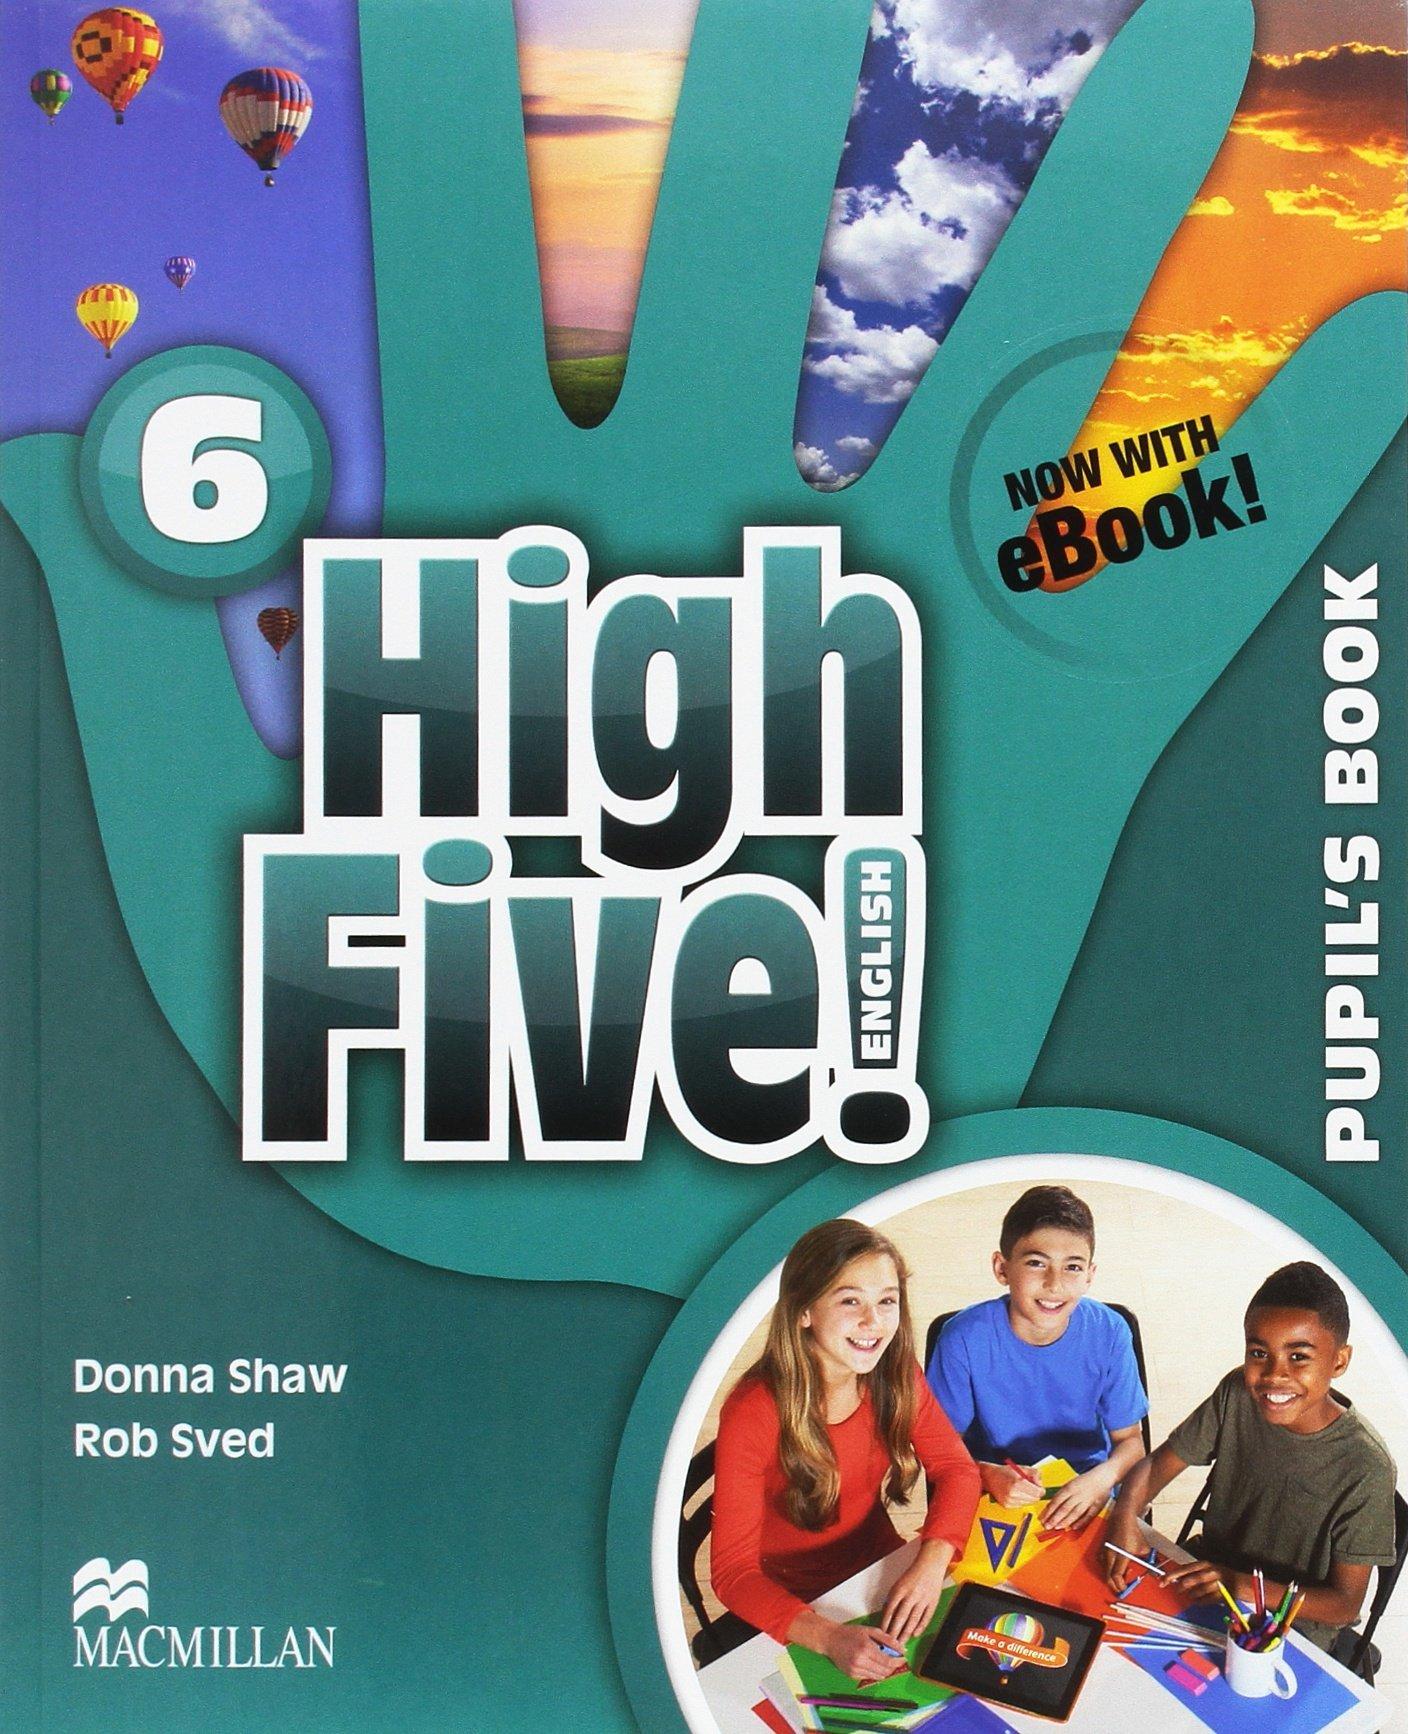 HIGH FIVE! 6 Pb (ebook) Pk (Inglés) Tapa blanda – 2015 Donna Shaw Joanne Ramsden Macmillan 1380014719